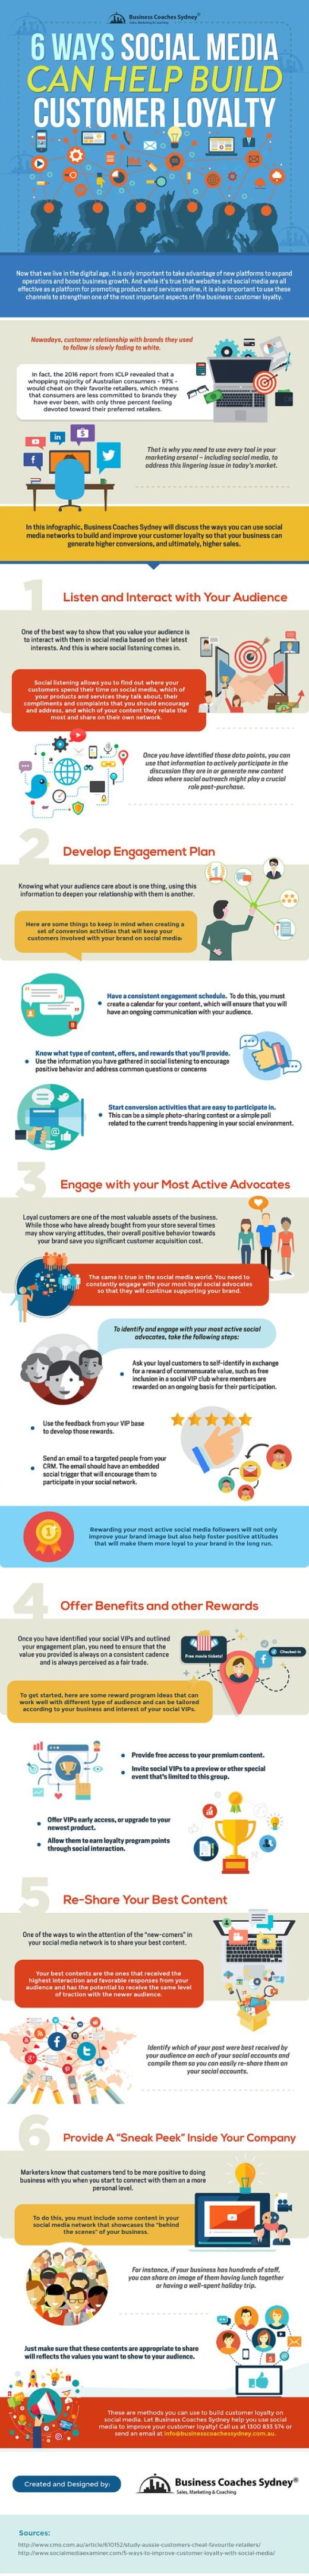 Brand_Loyalty_Social_Media_Infographic